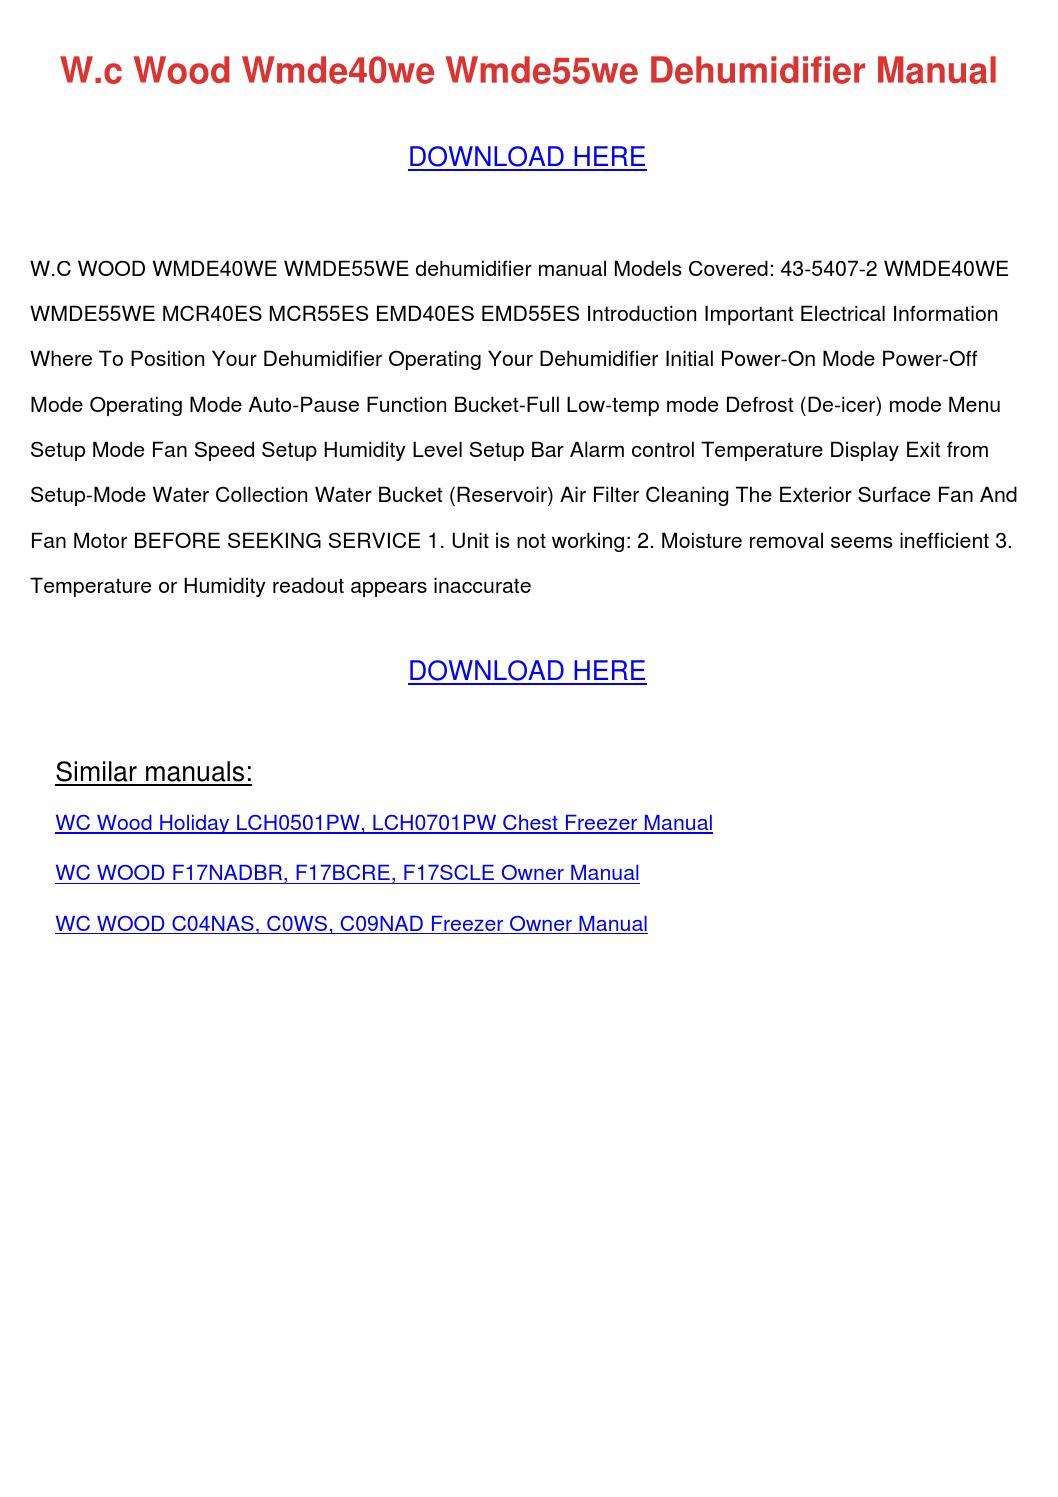 Wc Wood Wmde40we Wmde55we Dehumidifier Manual By